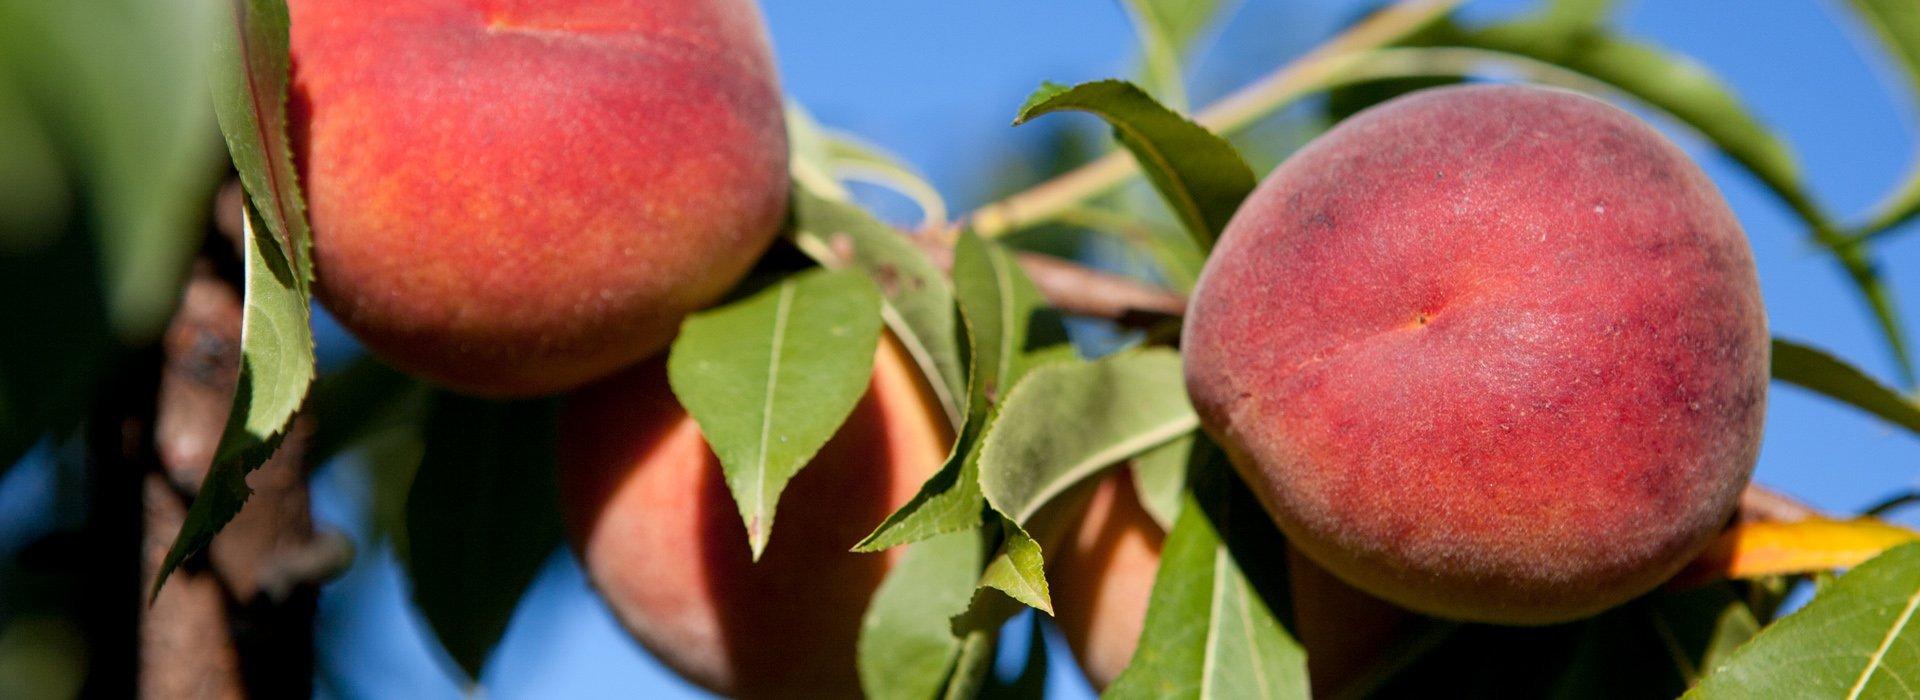 Photo of the peach tree